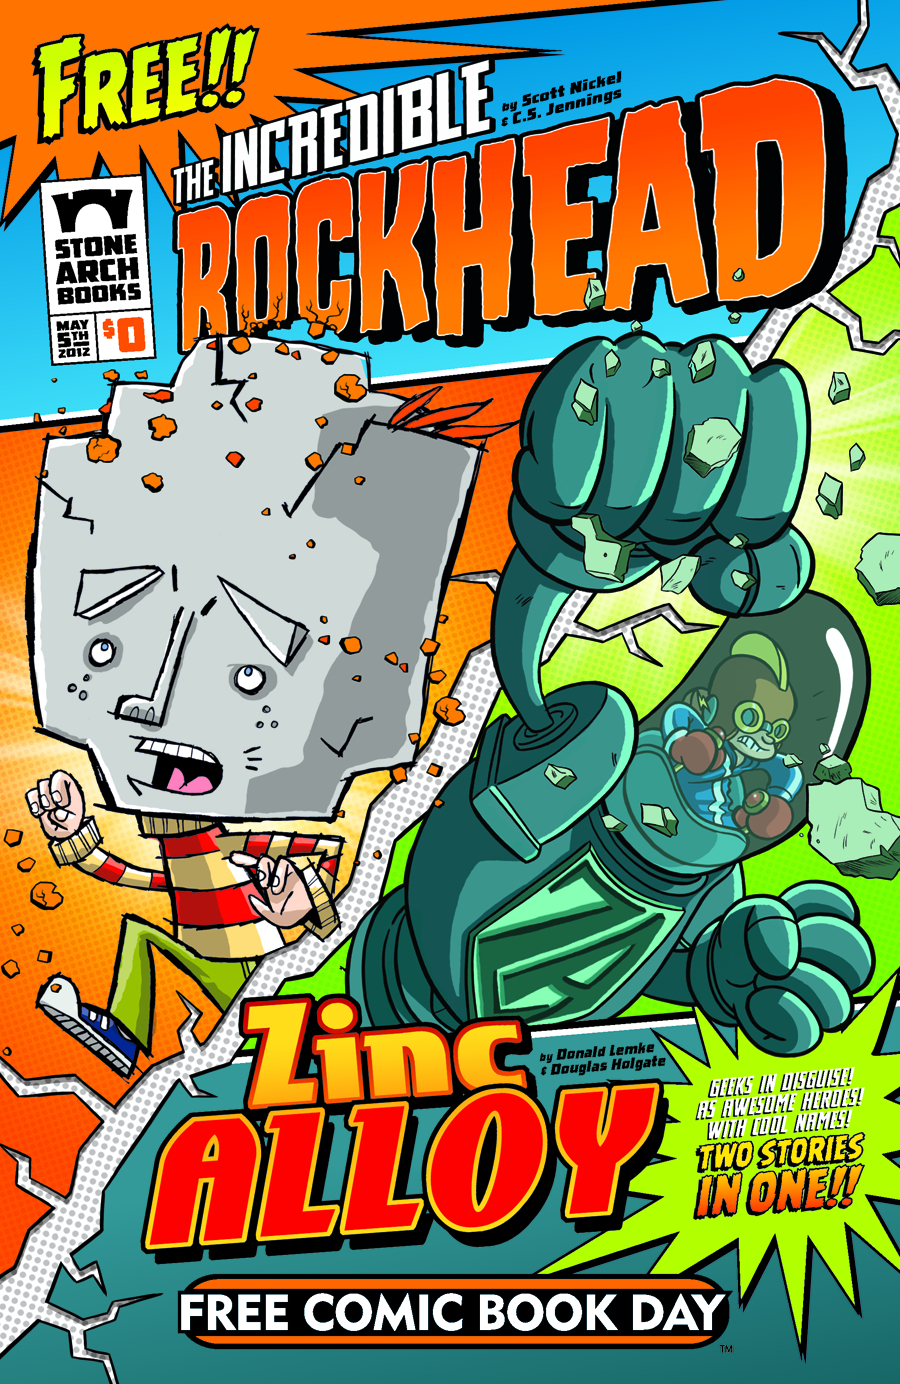 STK459221 Free Comic Book Day 2012: Reviews!